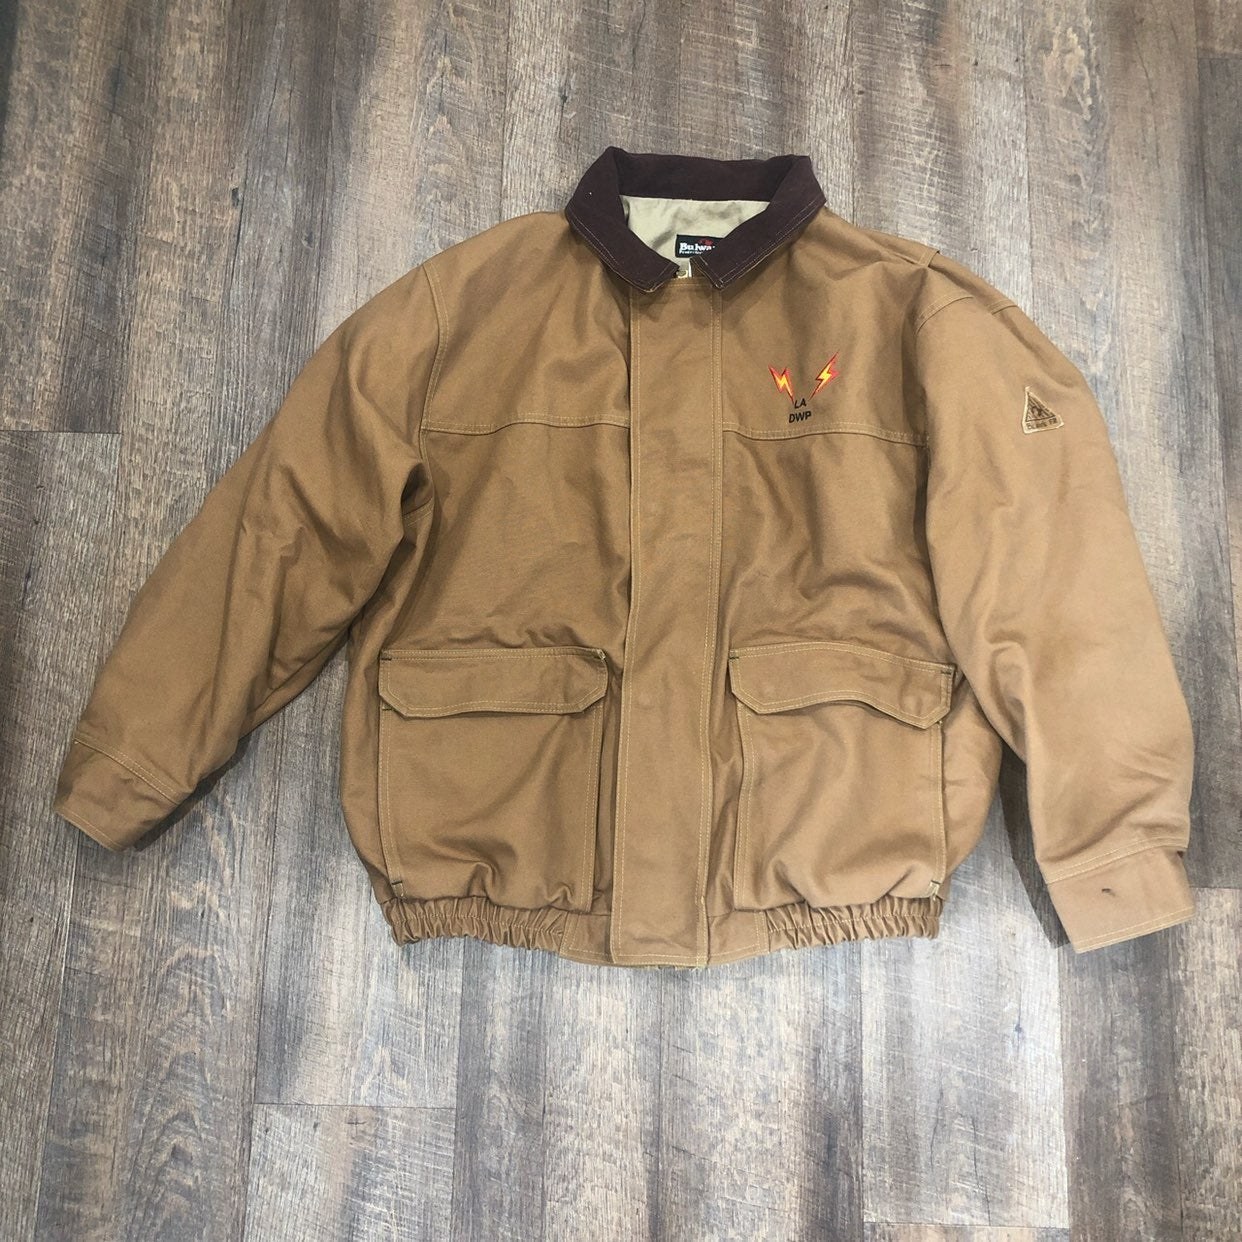 Bulwark protective apparel Jacket